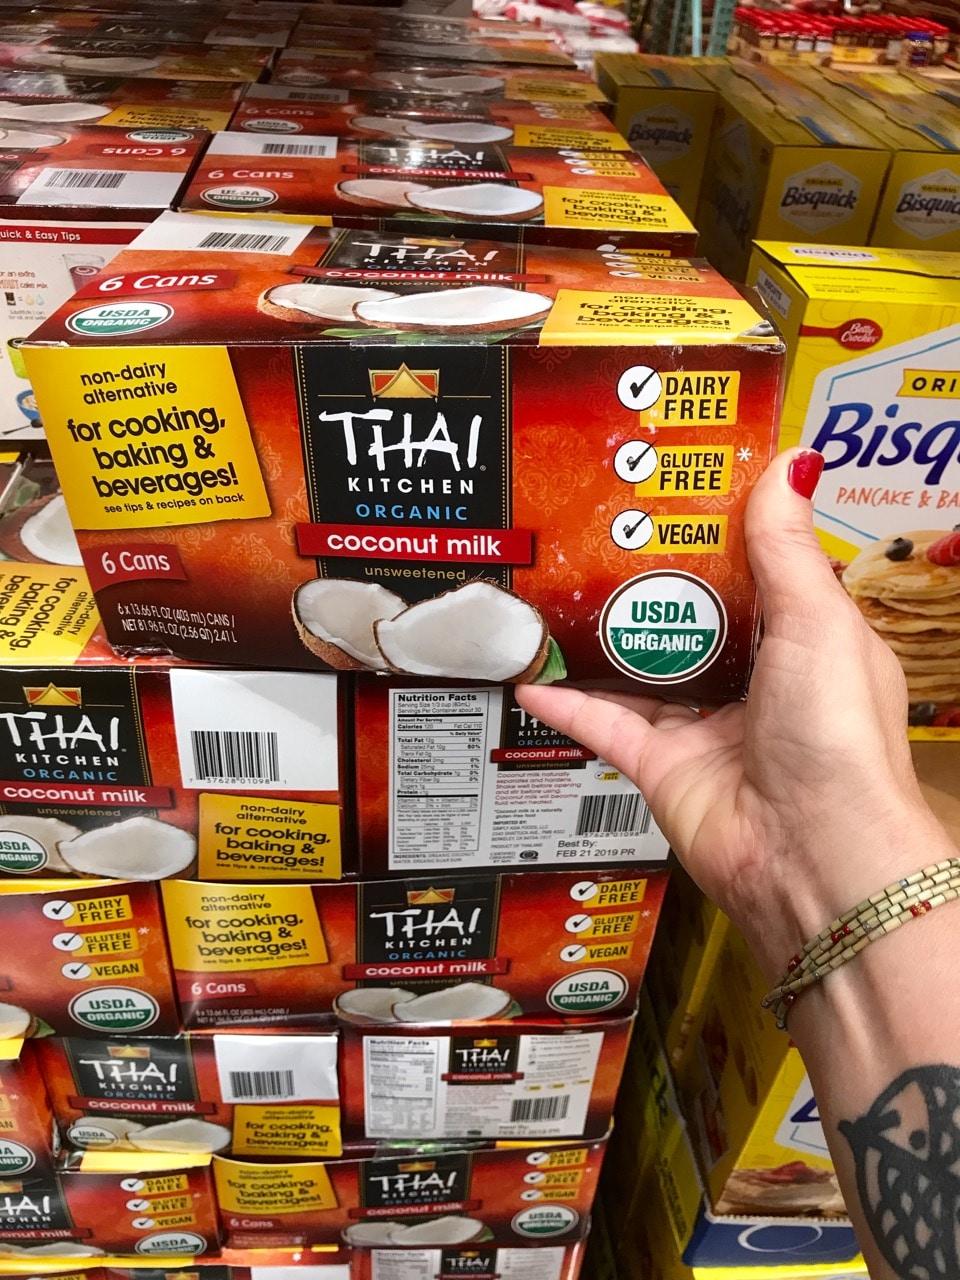 Thai Coconut Milk purchased at Costco